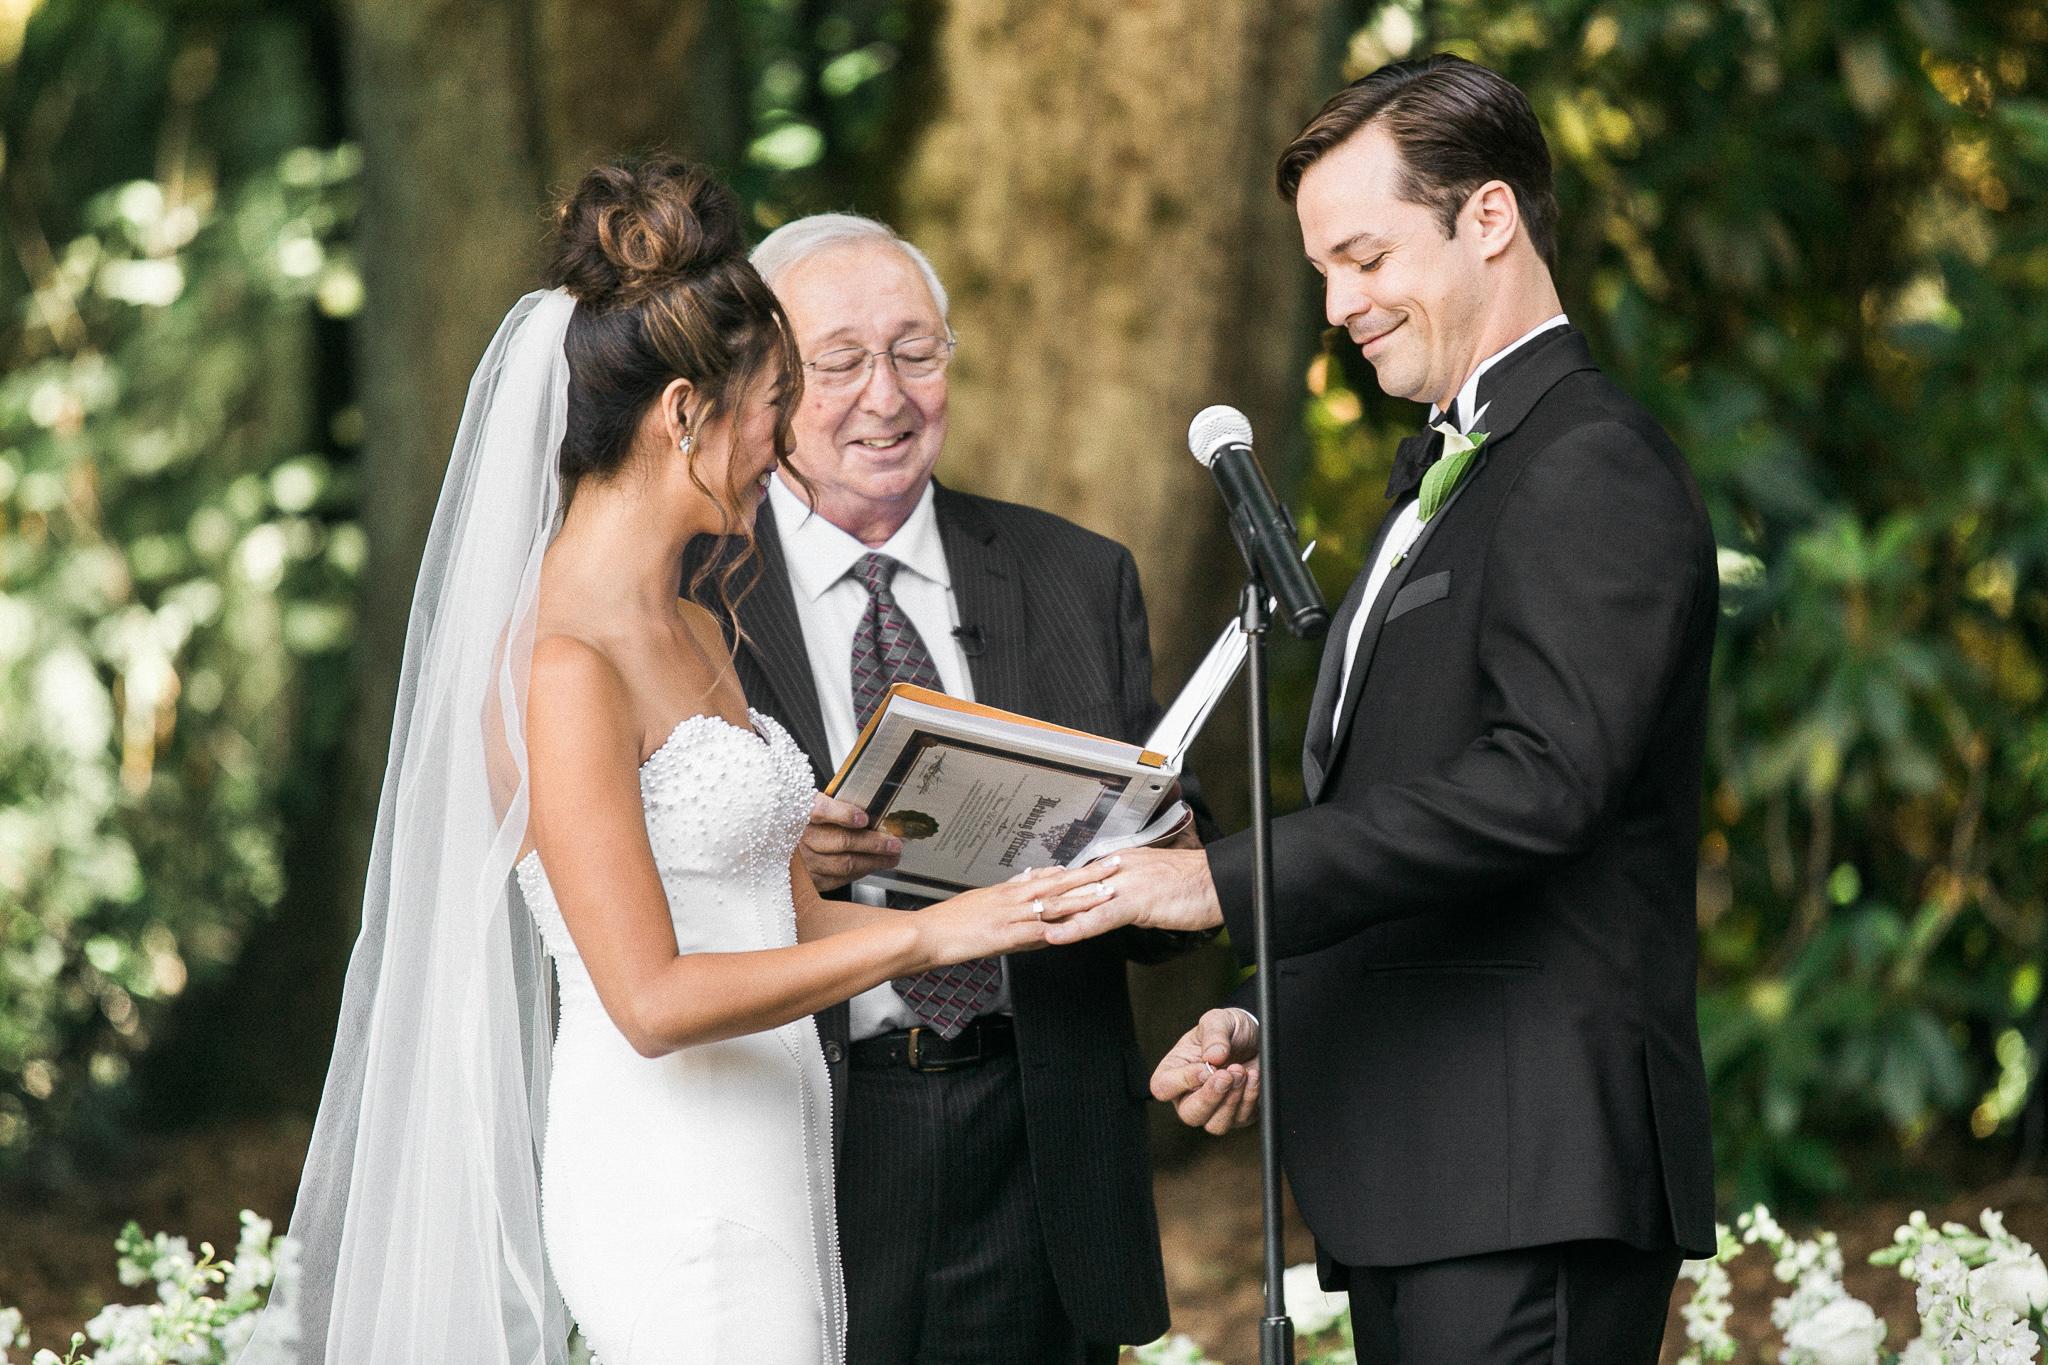 141OutliveCreative_Travel_Photographer_Videographer_Lewis&Clark_Oregon_Elegant_BlackTie_Destination_Wedding.jpg